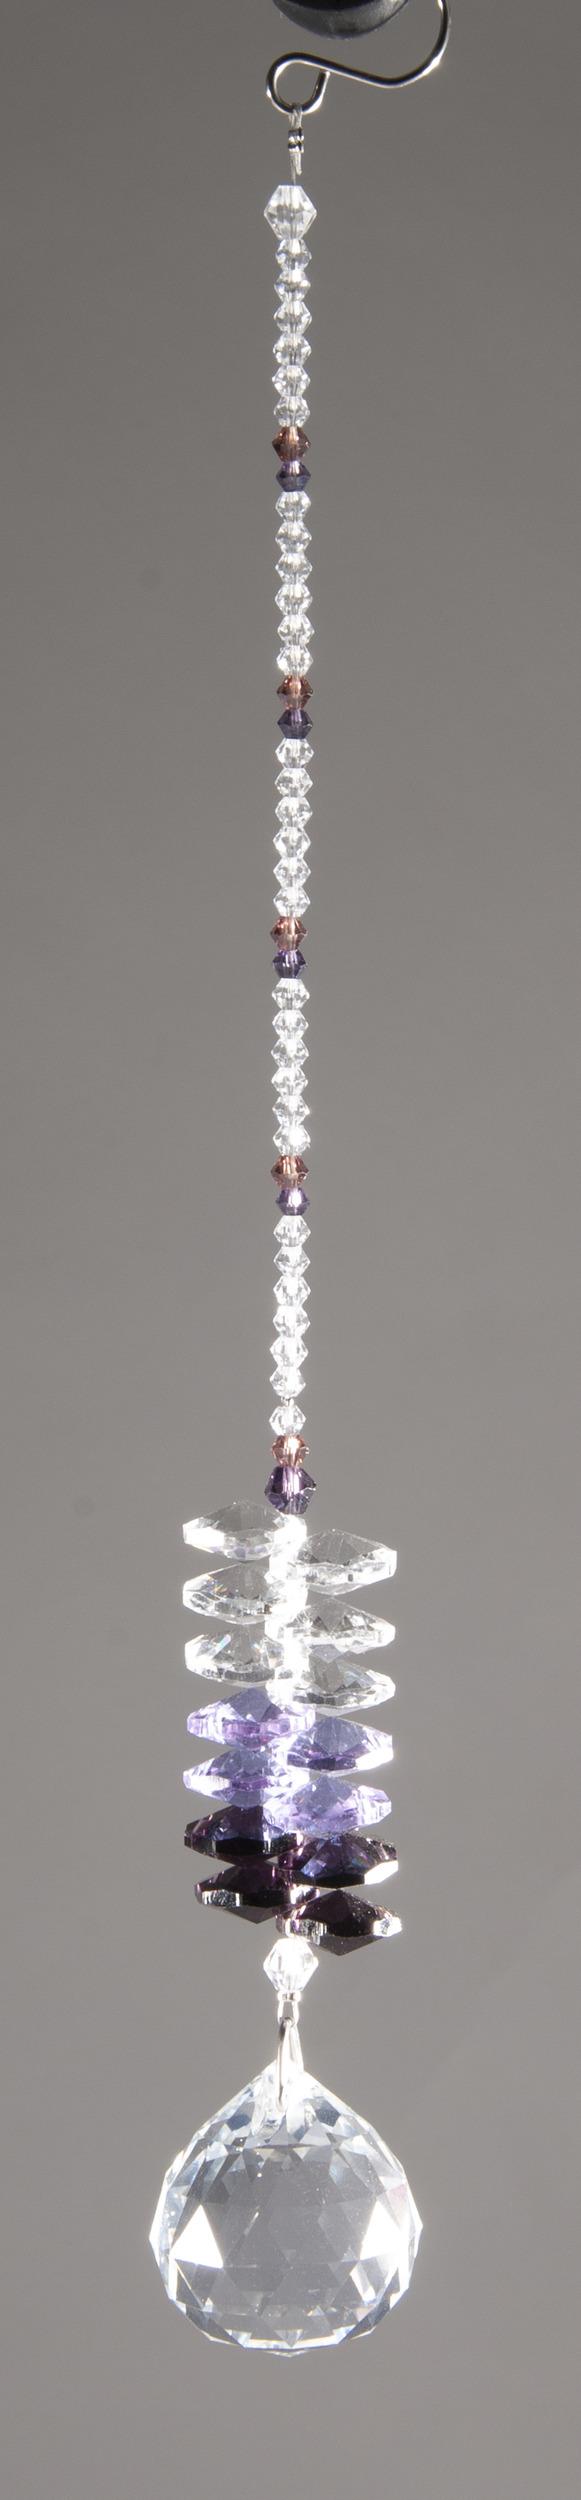 Universumskristall lila